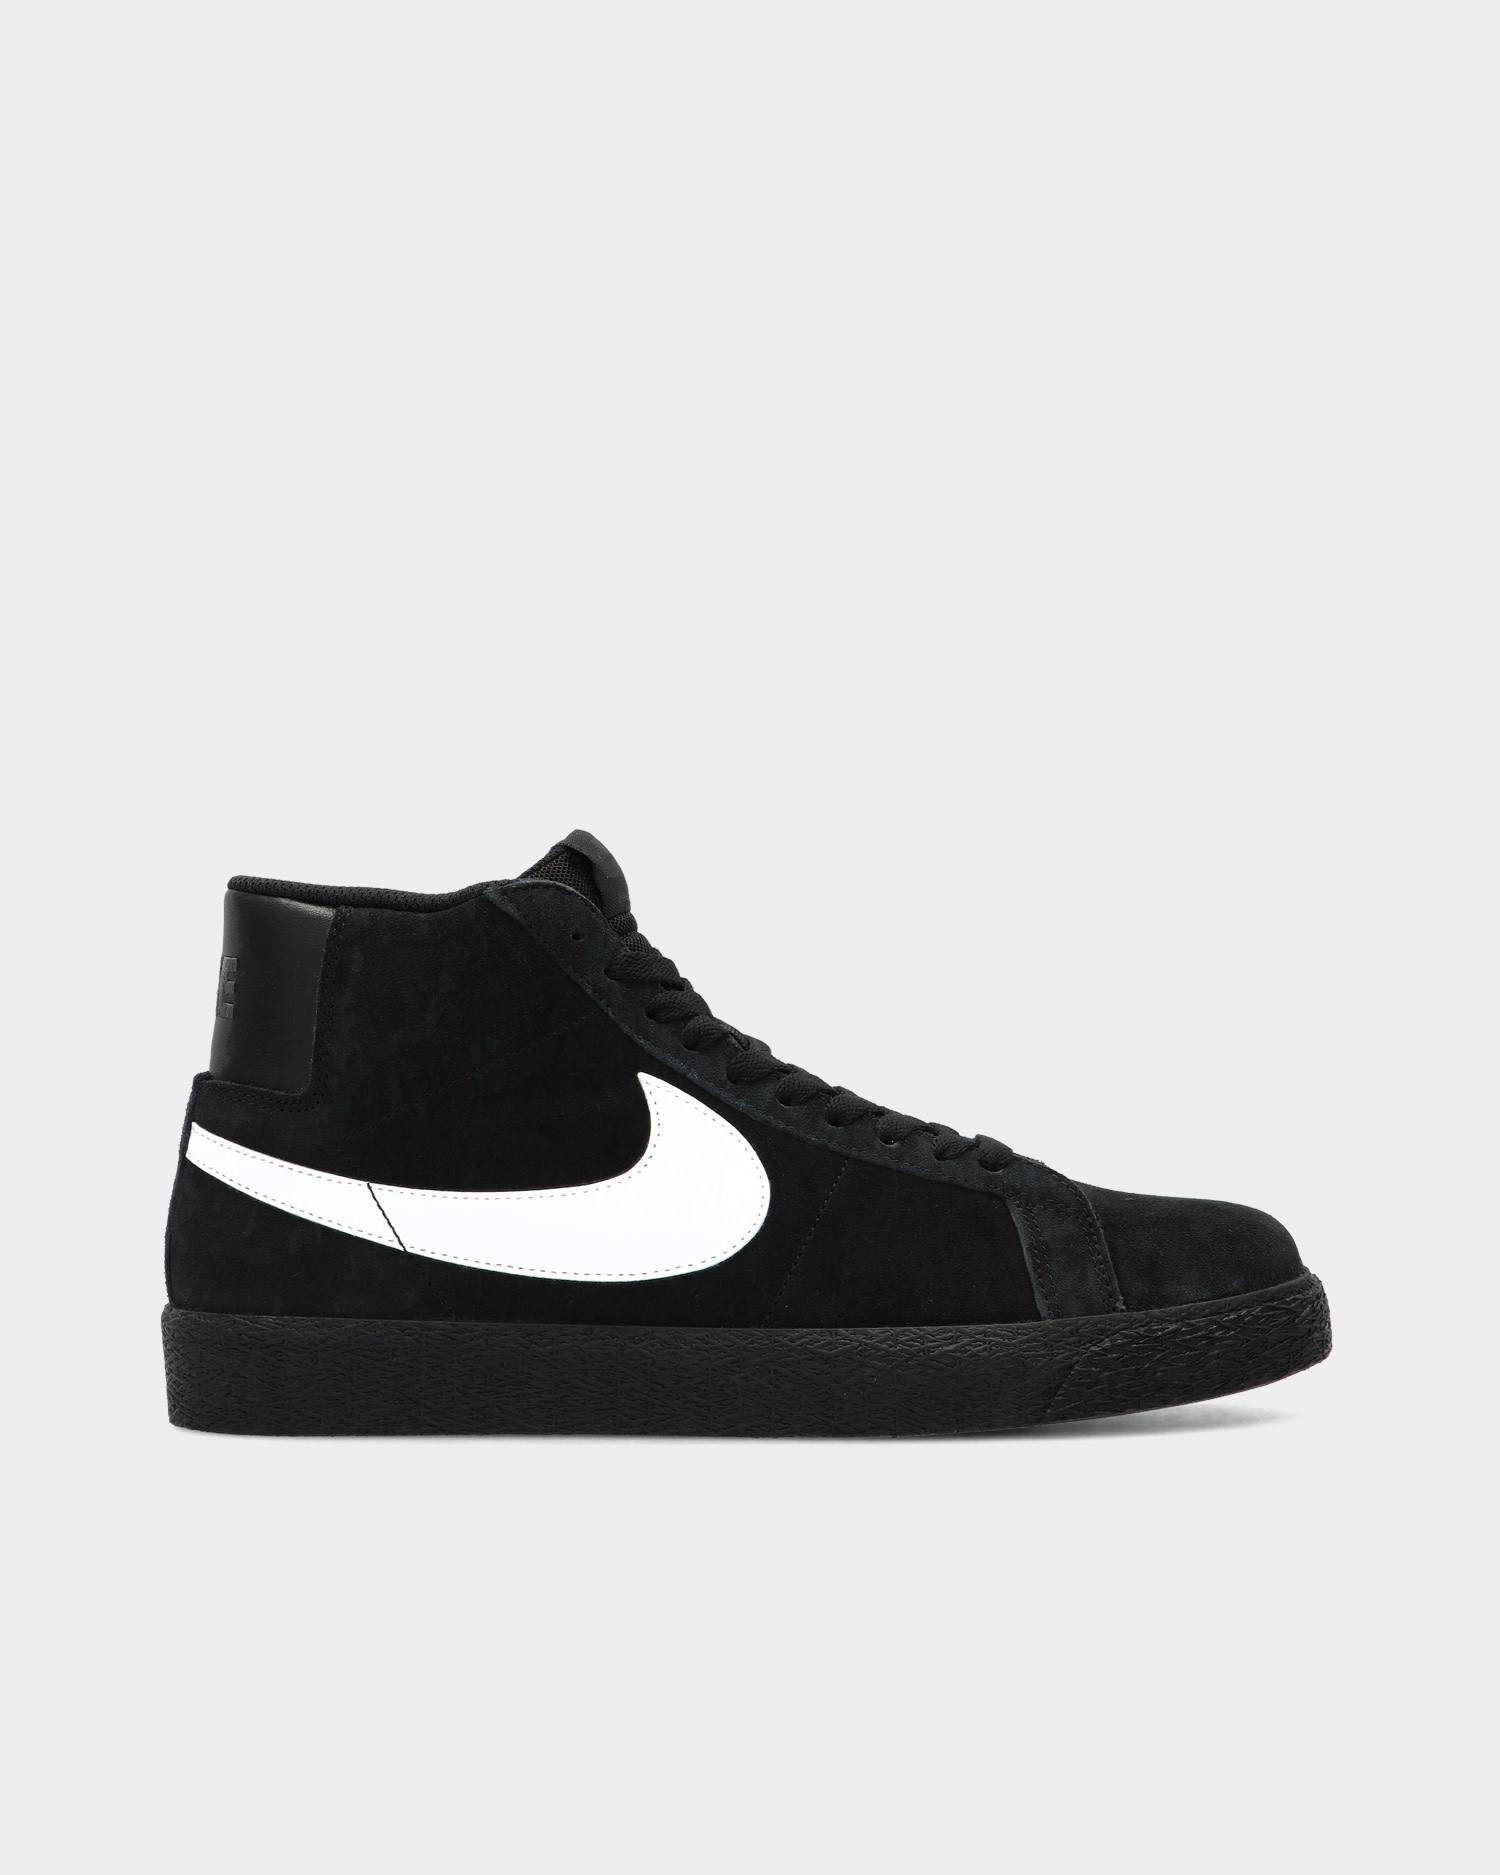 Nike SB Zoom Blazer Mid Black/White/Black